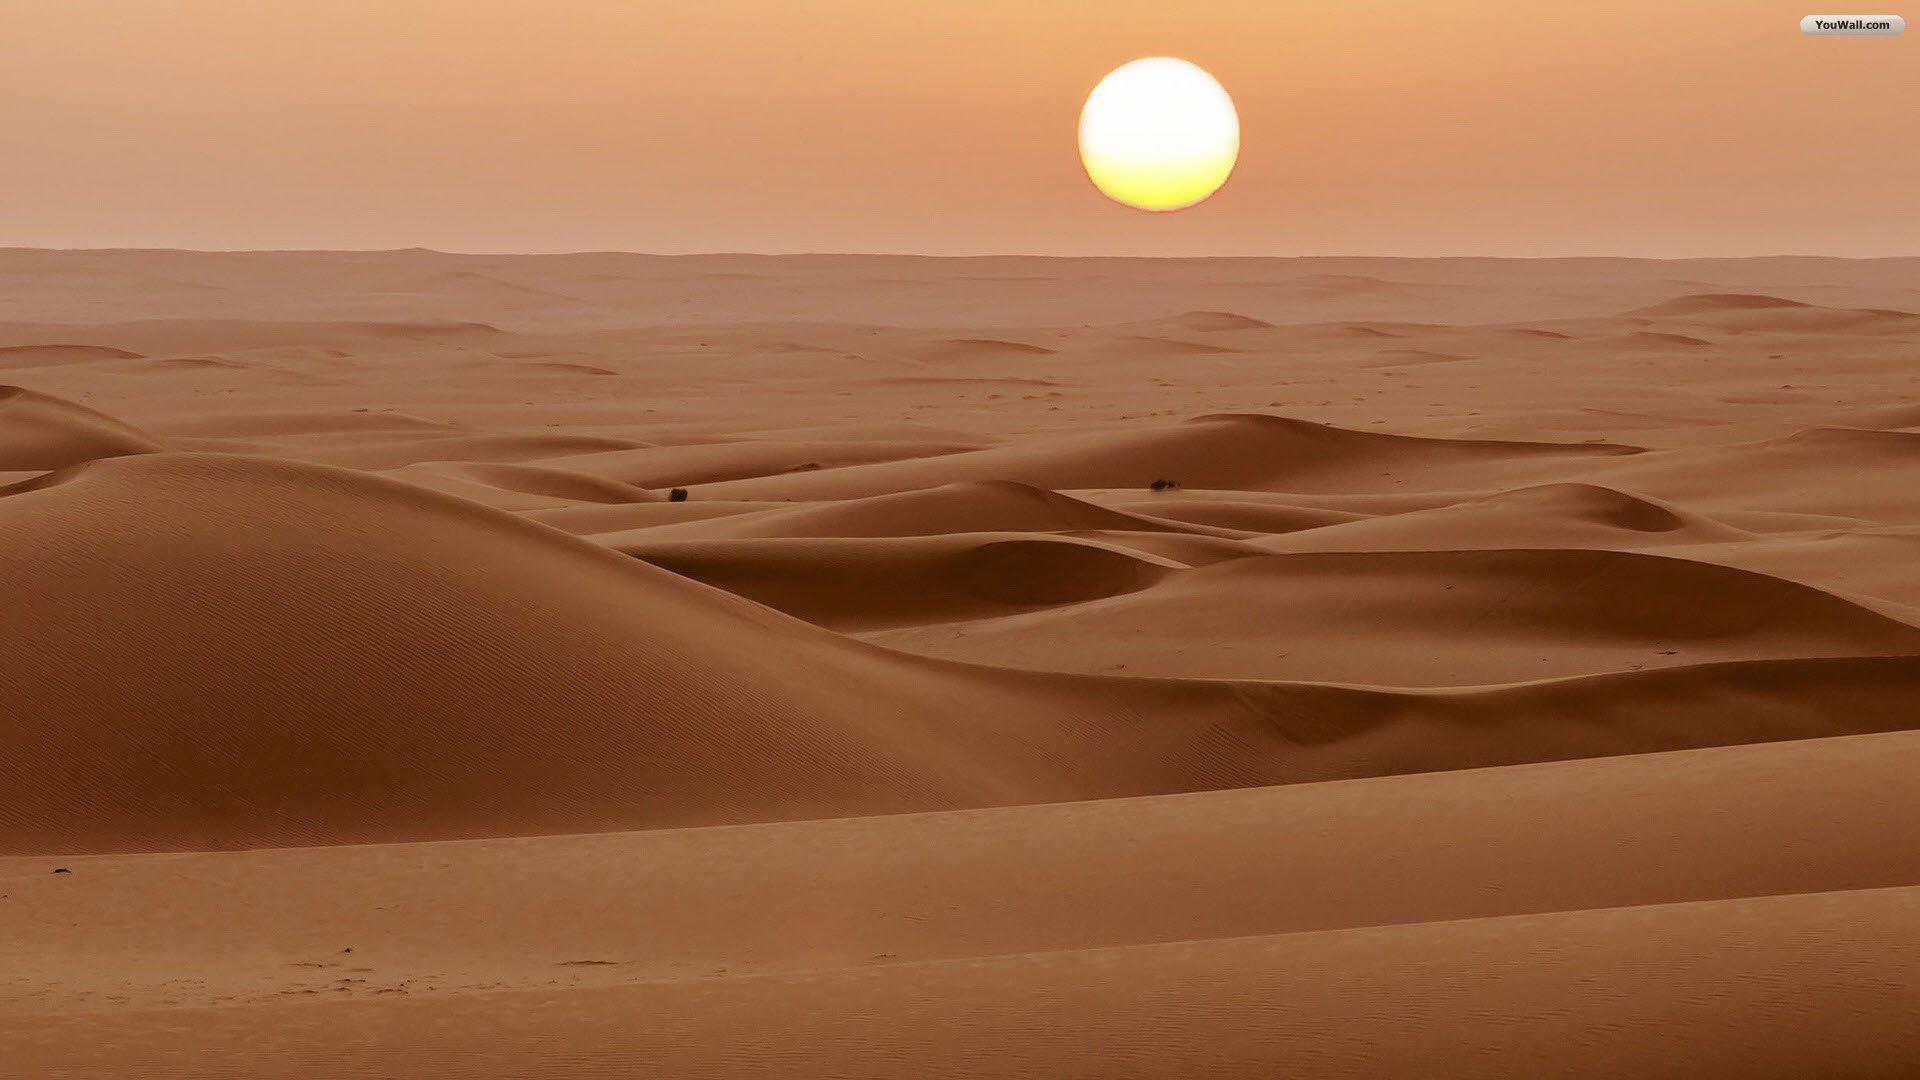 Sahara Desert Wallpapers Top Free Sahara Desert Backgrounds Wallpaperaccess